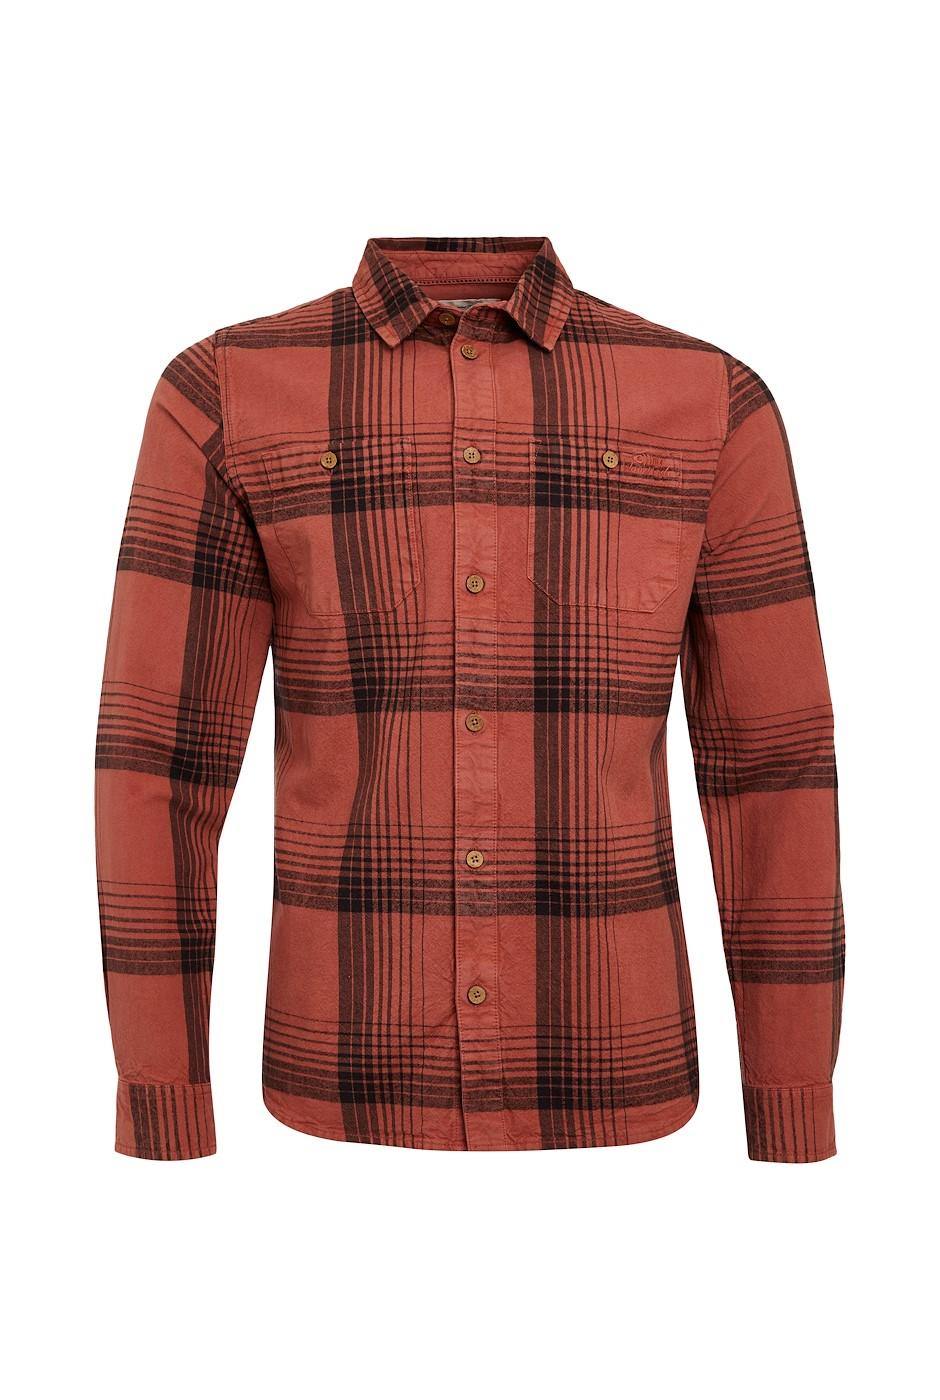 Chester Organic Cotton Long Sleeve Check Shirt Rust